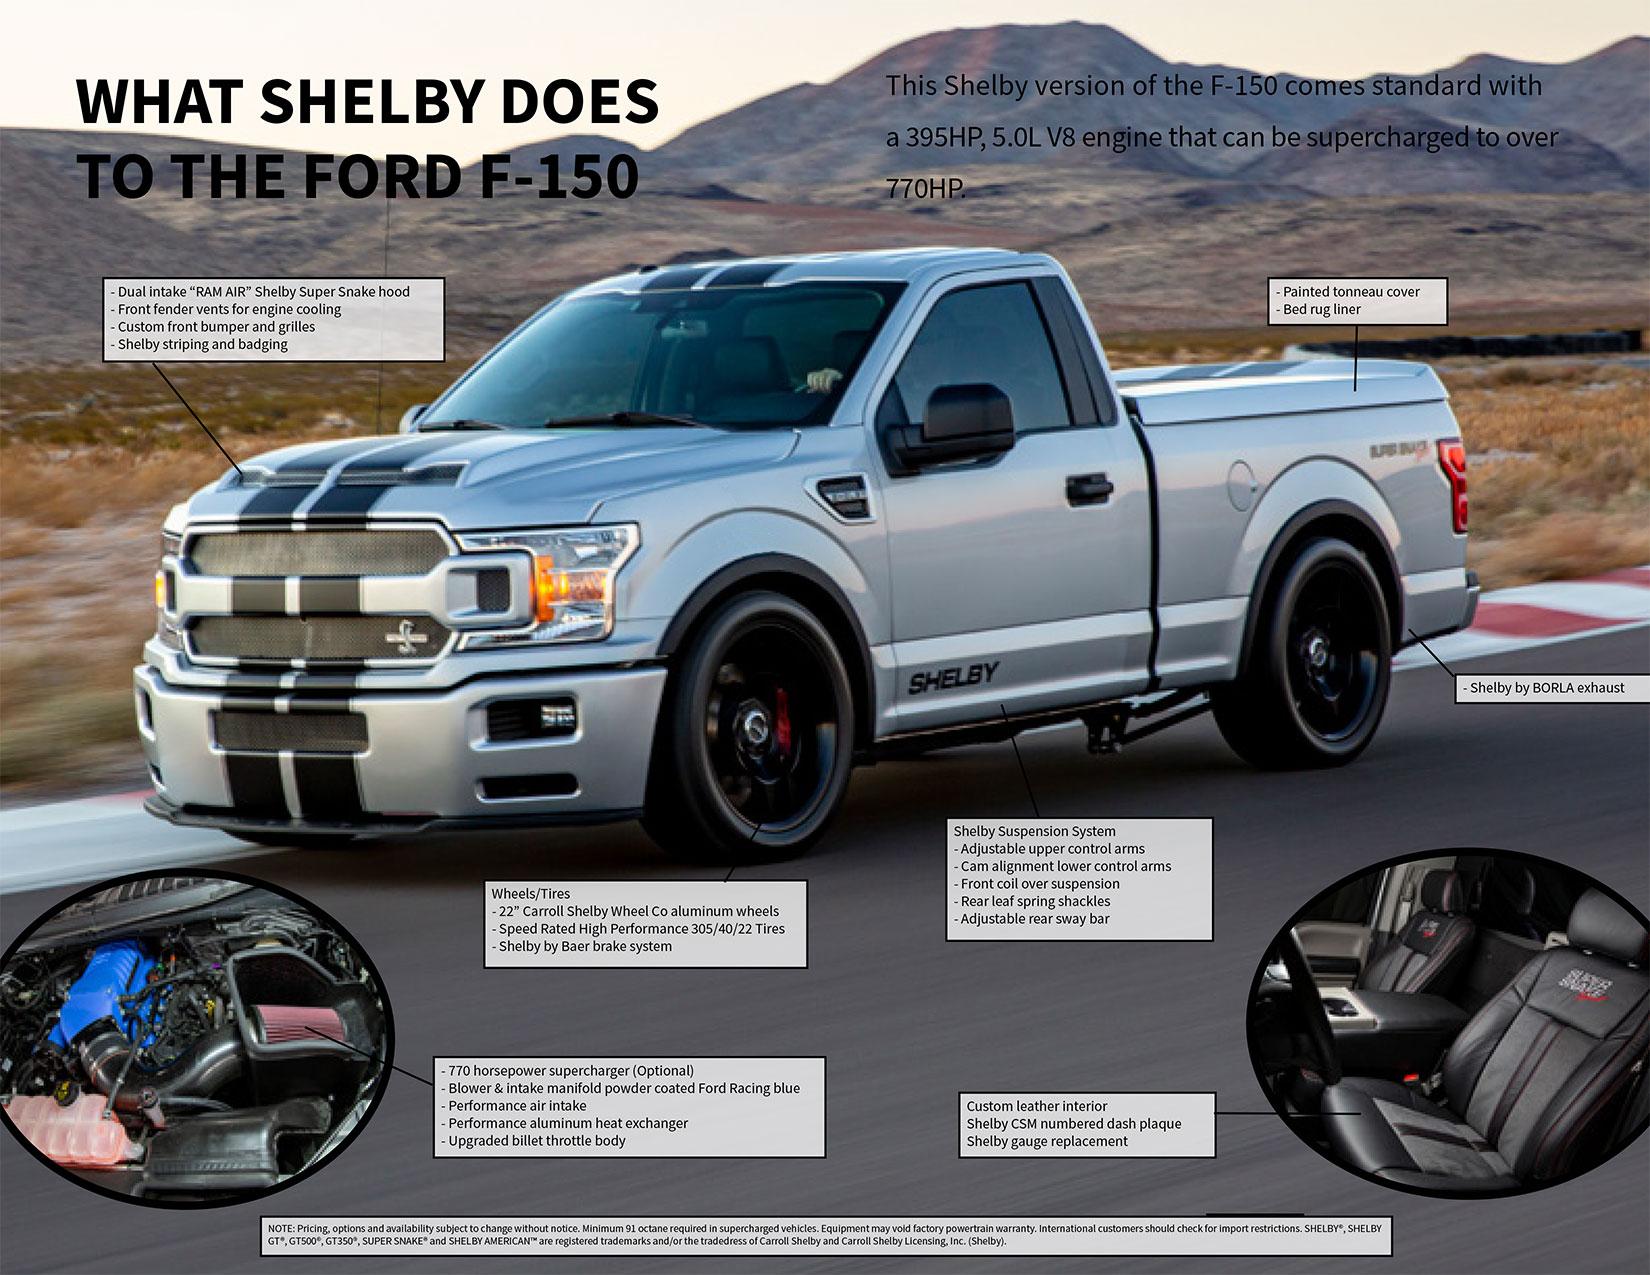 Shelby F 150 Super Snake Sport Www Shelby Com 702 942 7325